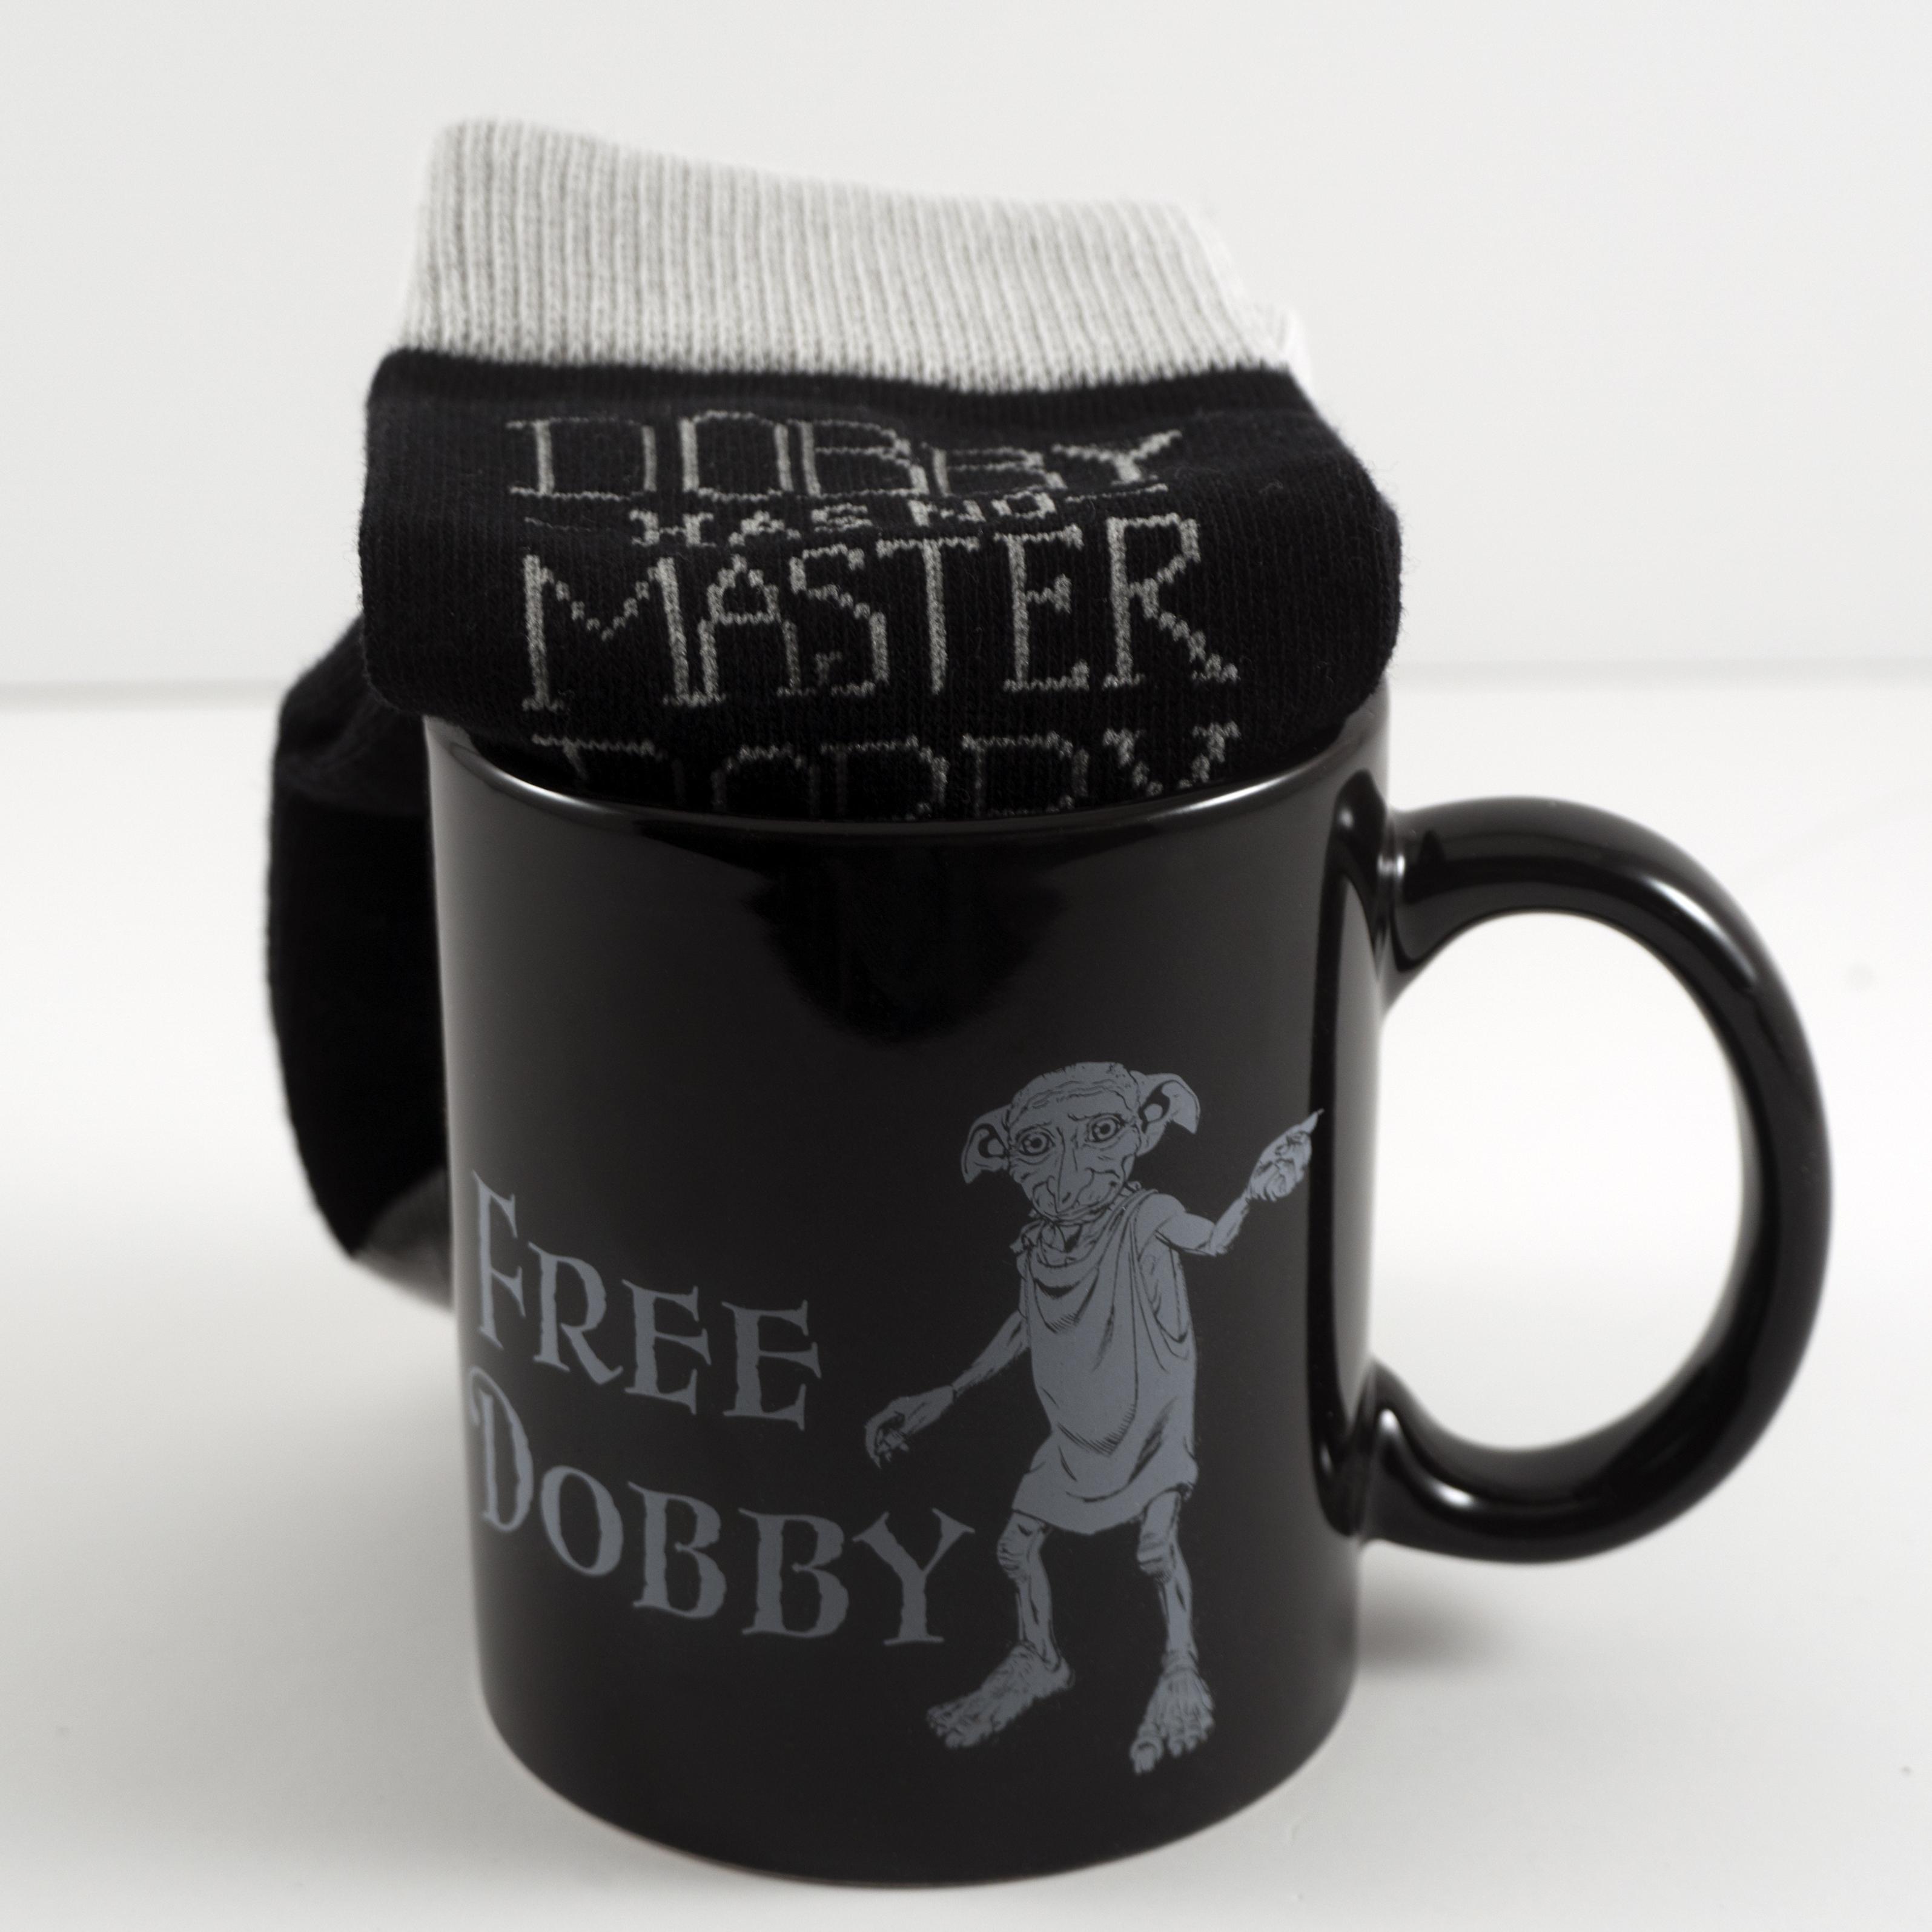 Eight3Five Dobby mug & socks